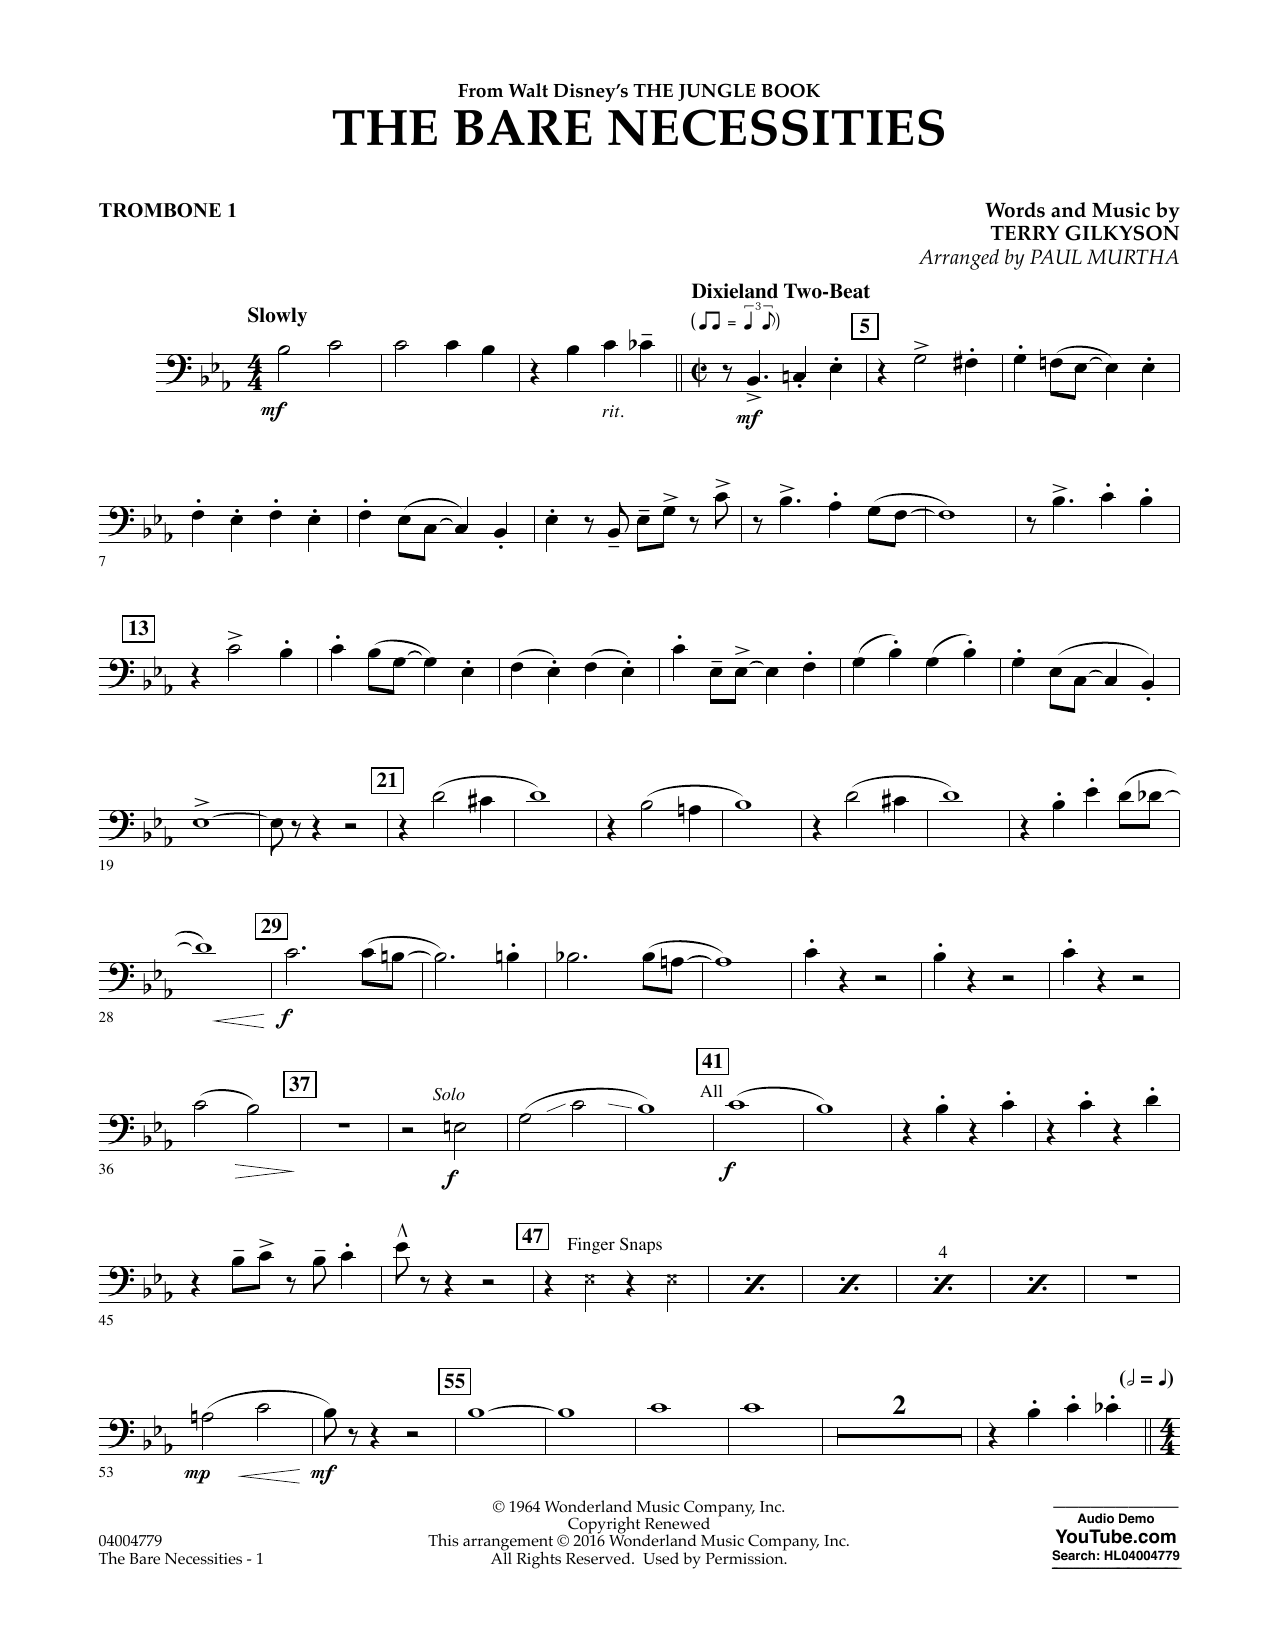 Terry Gilkyson - The Bare Necessities - Trombone 1